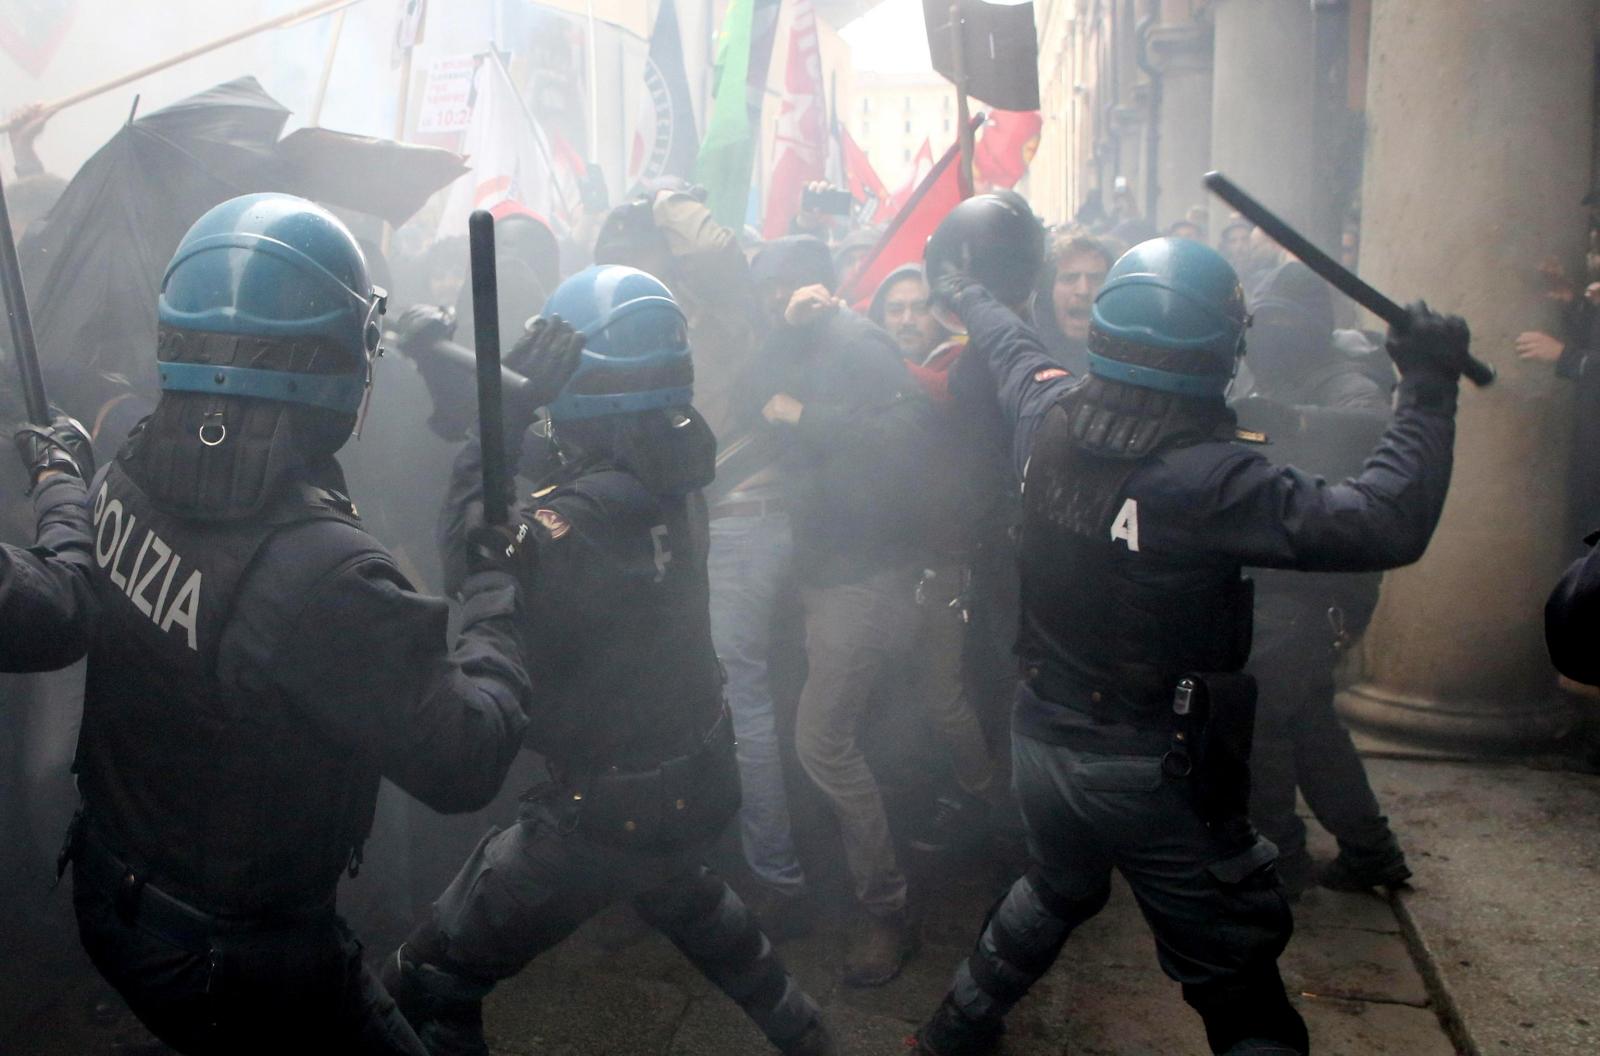 Starcie policji z demonstrantami skrajnie prawicowej partii Forza Nuova. Bolonia, Włochy. Fot. EPA/GIORGIO BENVENUTI